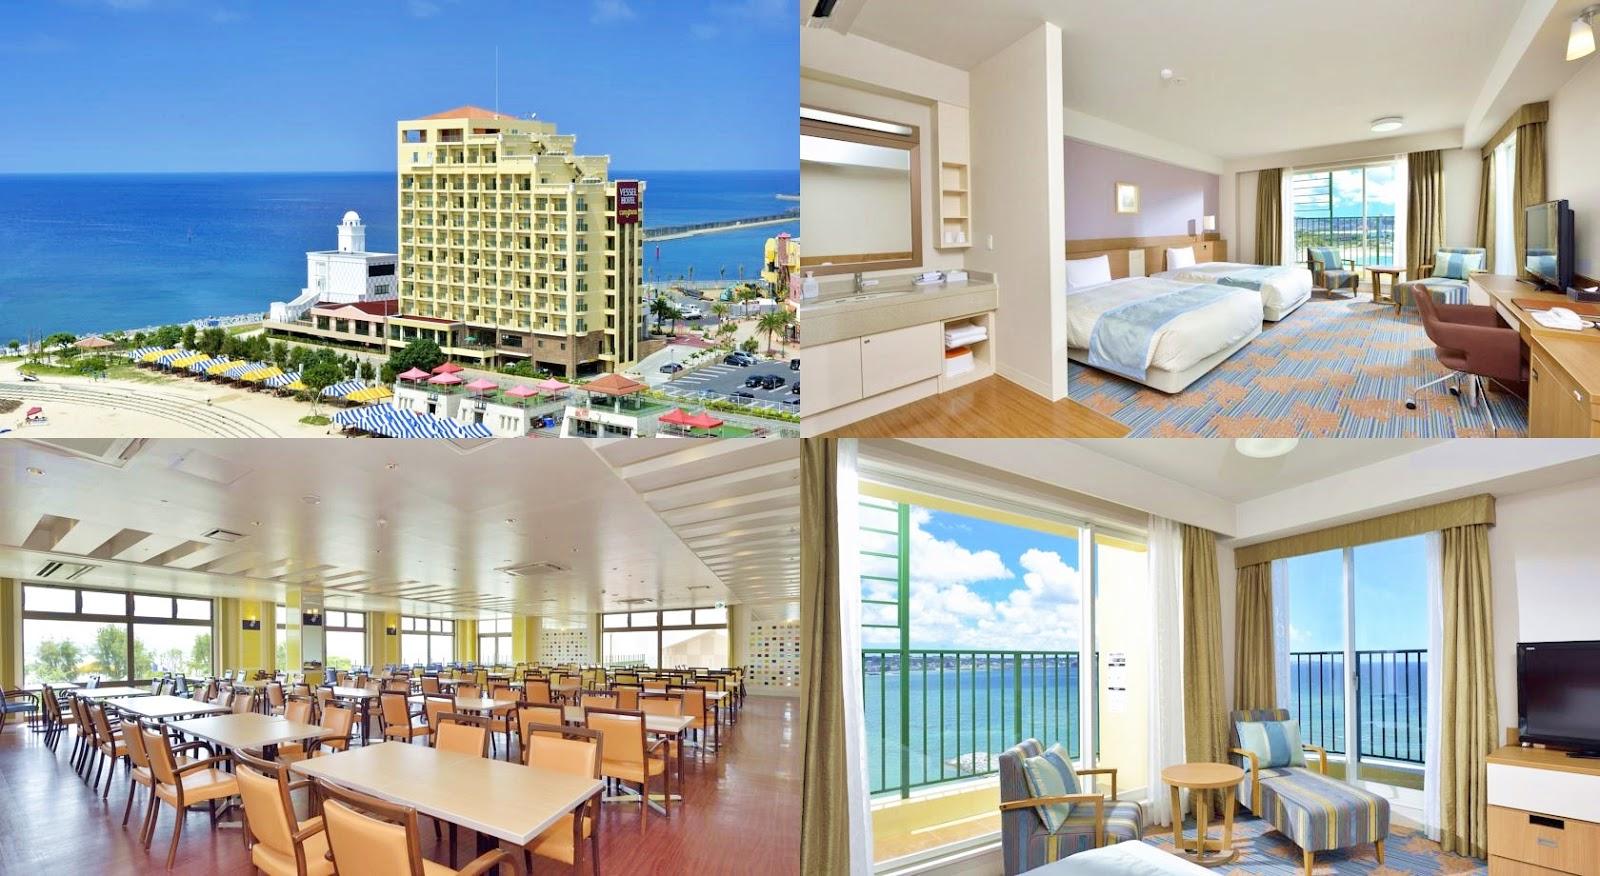 沖繩-住宿-推薦-沖繩坎帕納船舶酒店-Vessel-Hotel-Campana-Okinawa-hotel-recommendation